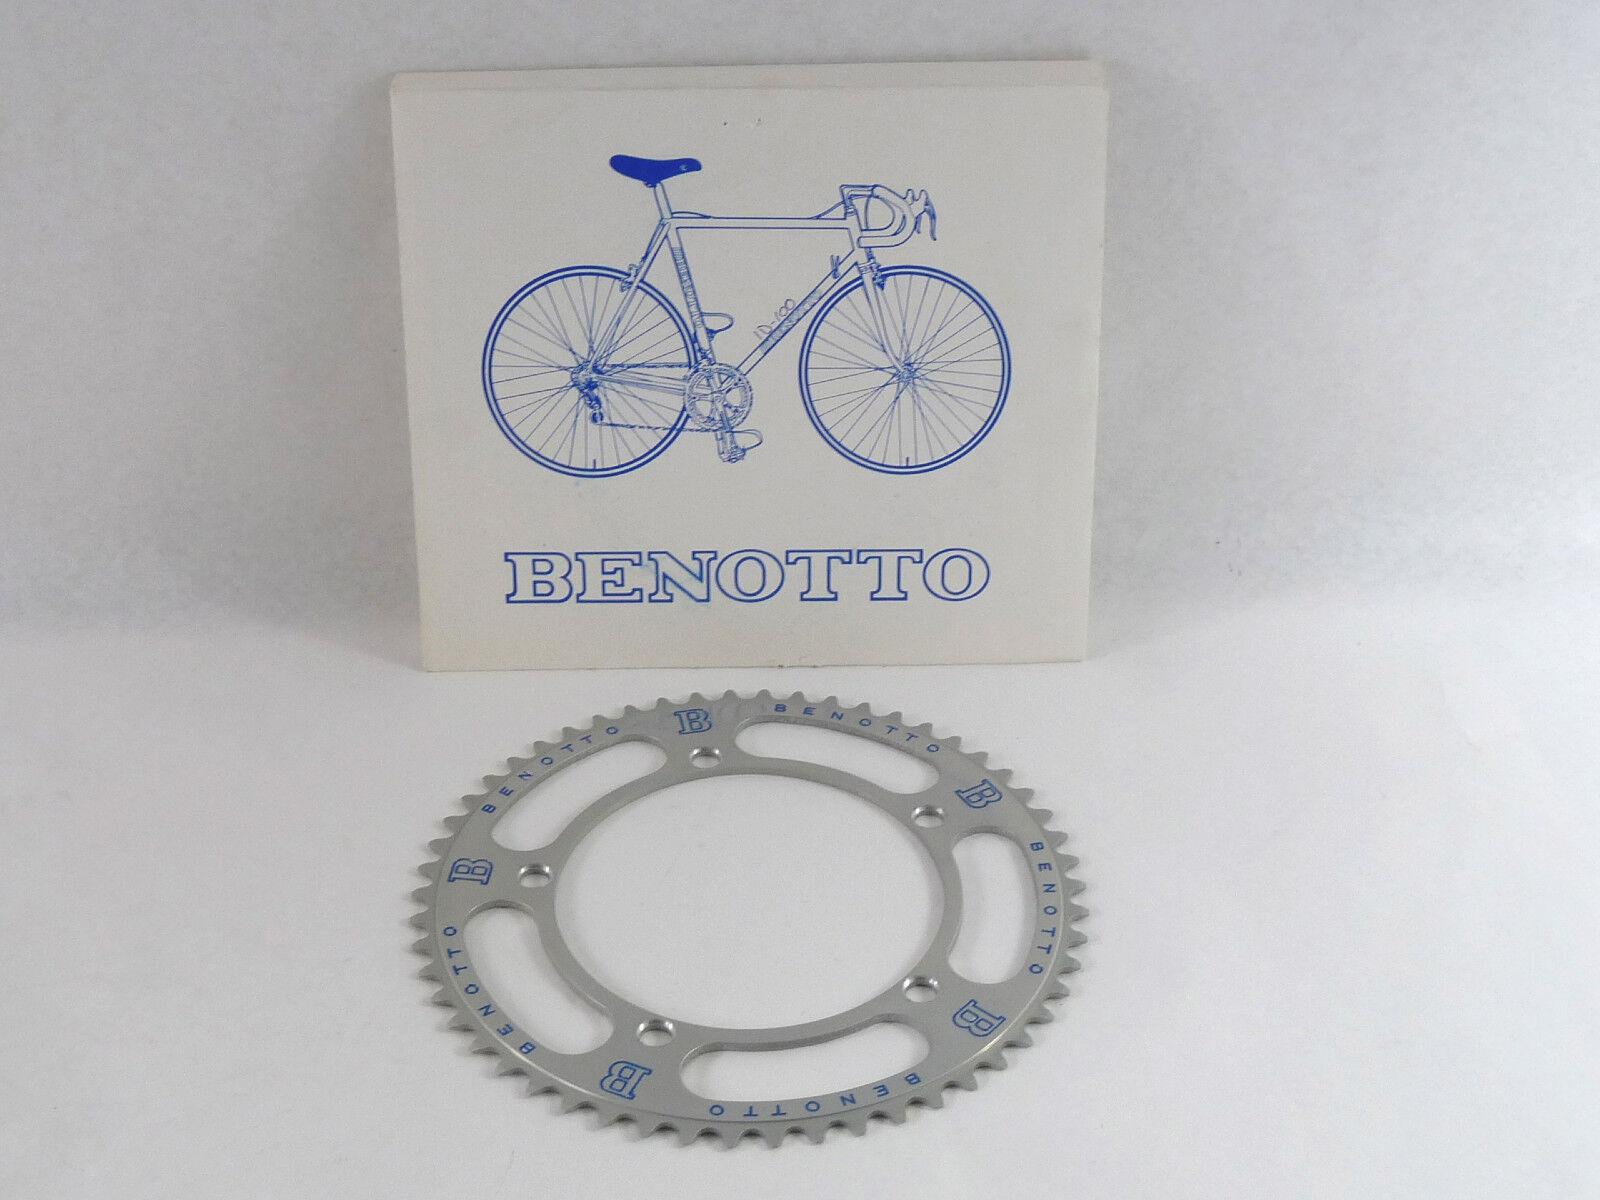 Benotto PLATO pantógrafo 54t 144 BCD 3 32  Vintage Bike Fit Campagnolo nos